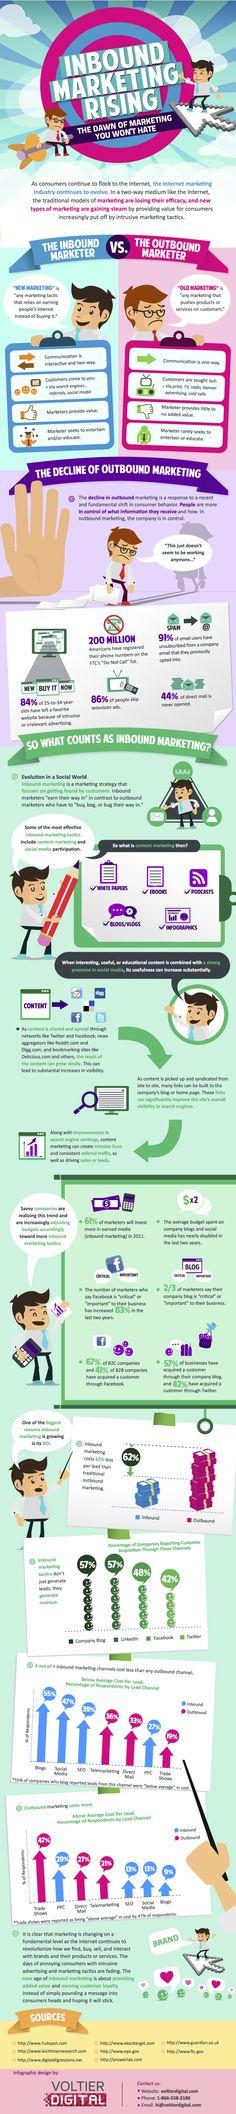 #InboundMarketing - The Dawn of Marketing [#Infographic]